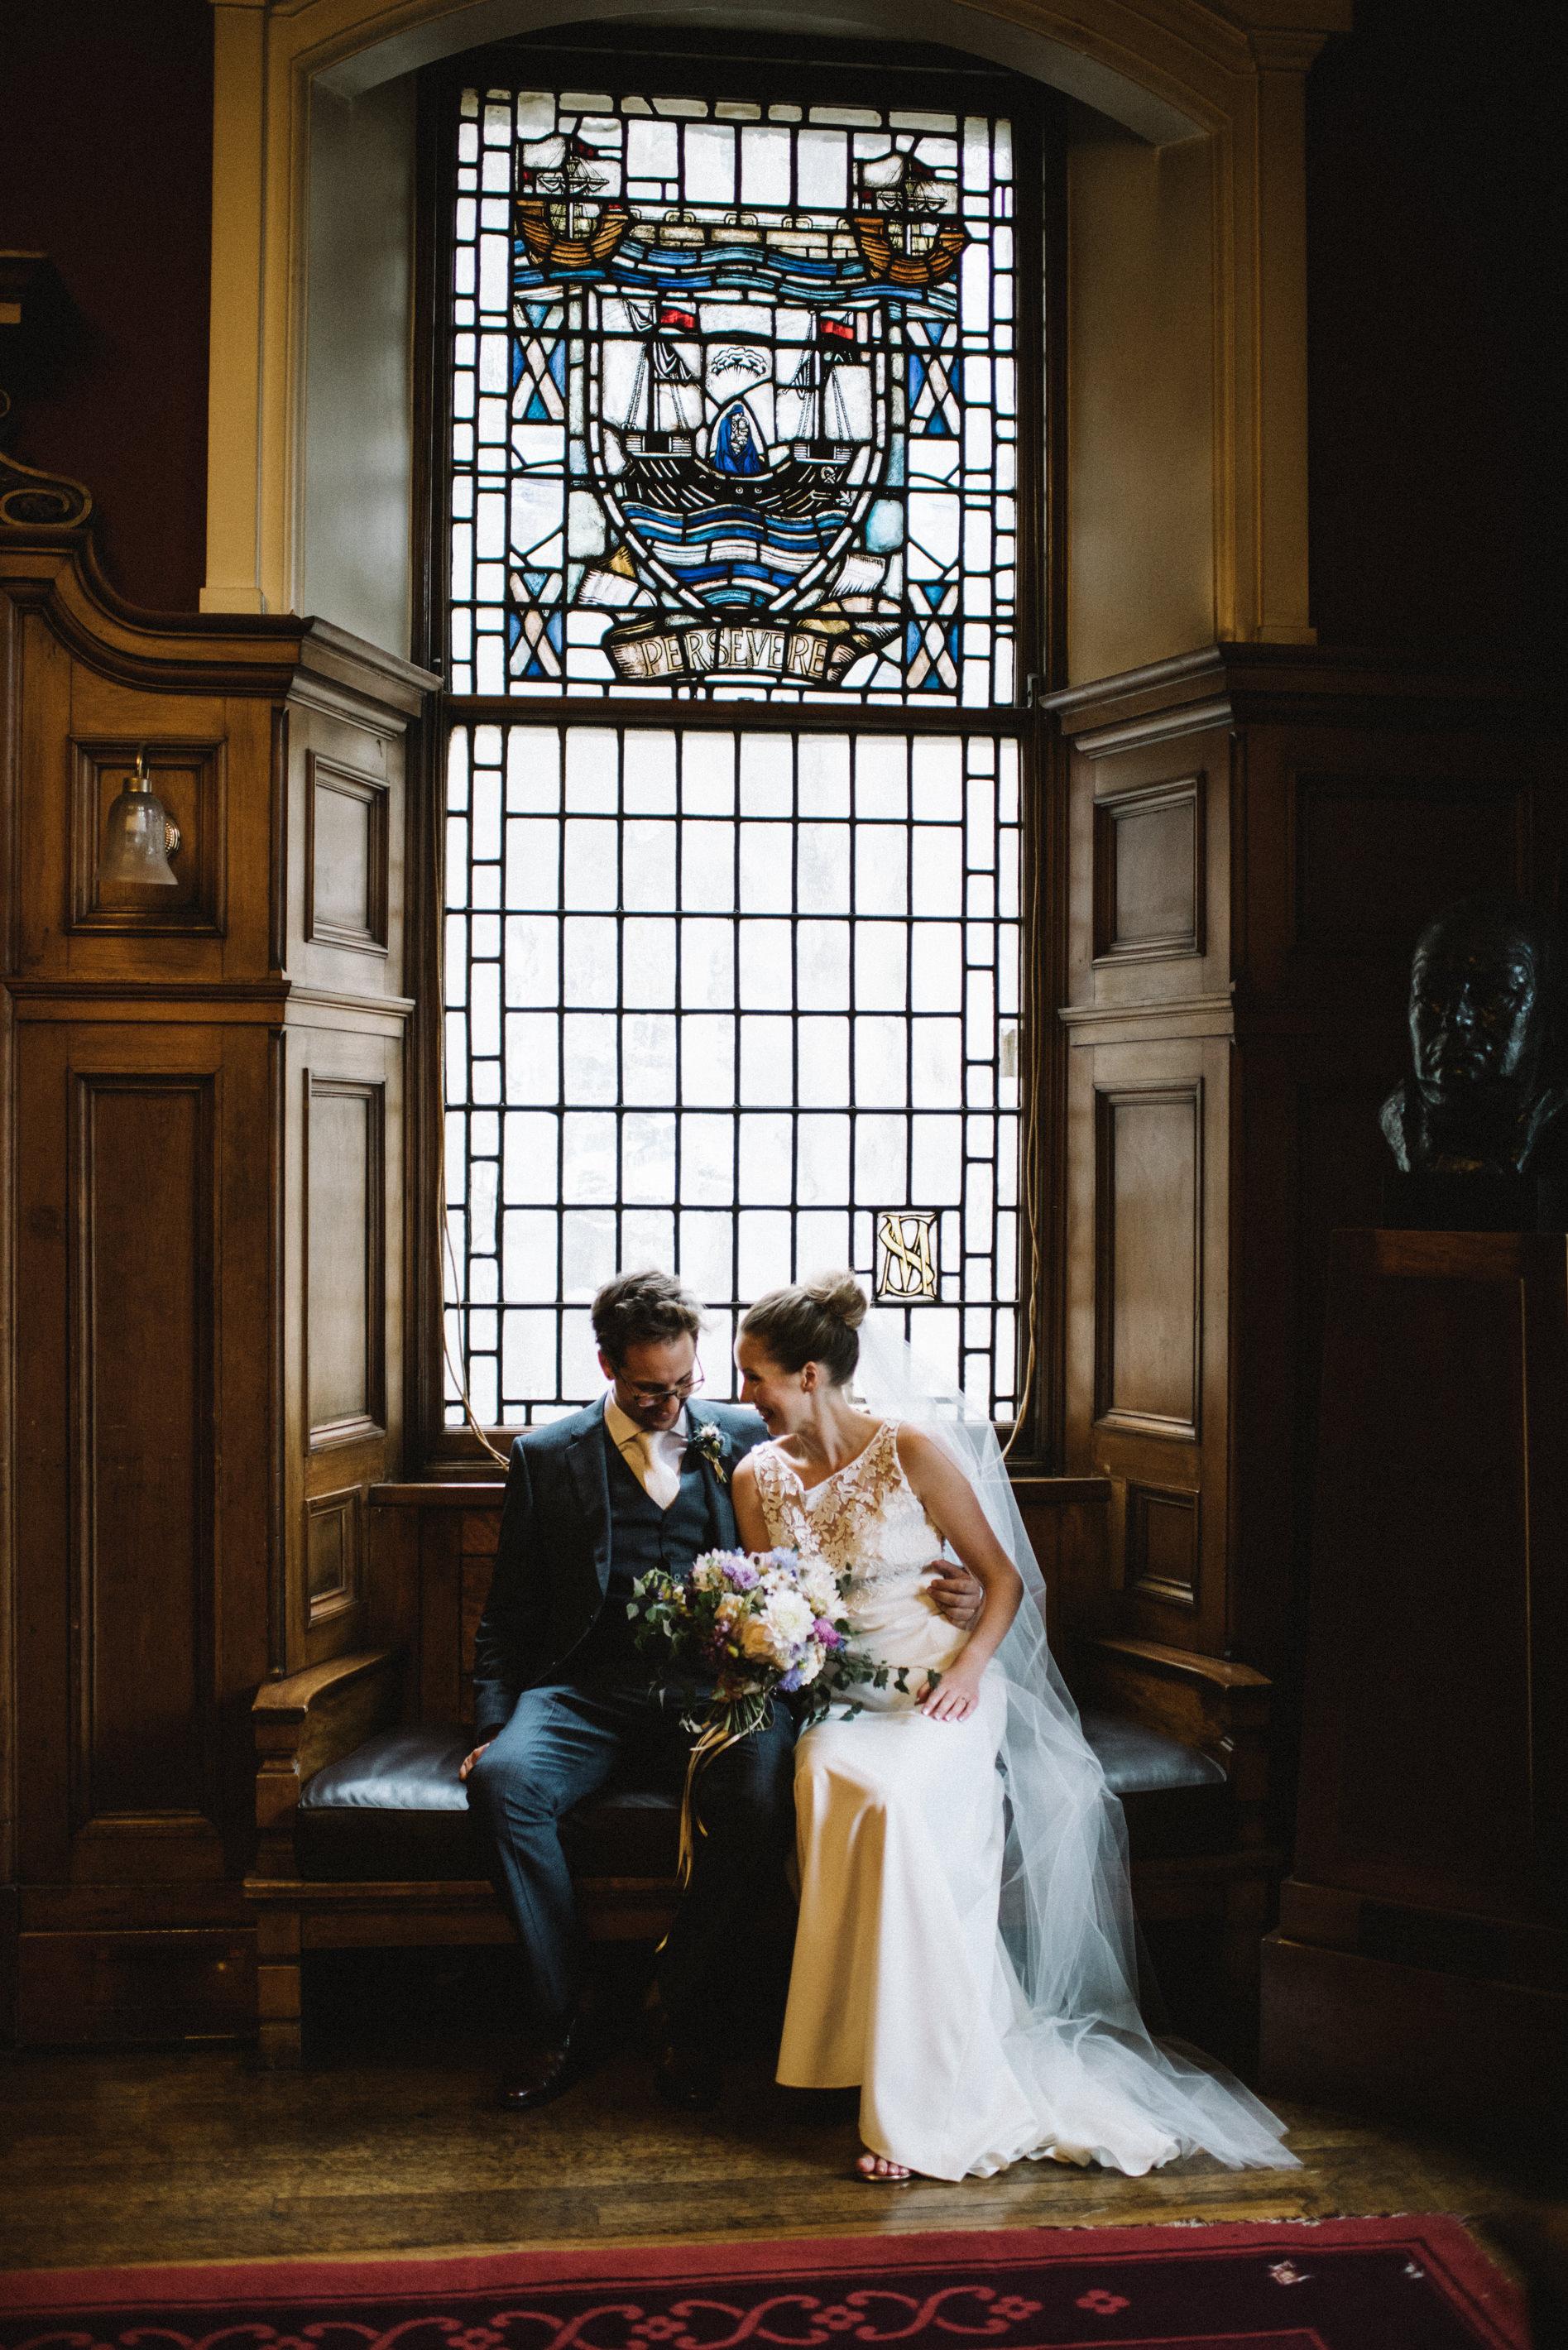 0200-LISA-DEVINE-PHOTOGRAPHY-ALTERNATIVE-WEDDING-PHOTOGRAPHY-SCOTLAND-DESTINATION-WEDDINGS-GLASGOW-WEDDINGS-COOL-WEDDINGS-STYLISH-WEDDINGS.JPG